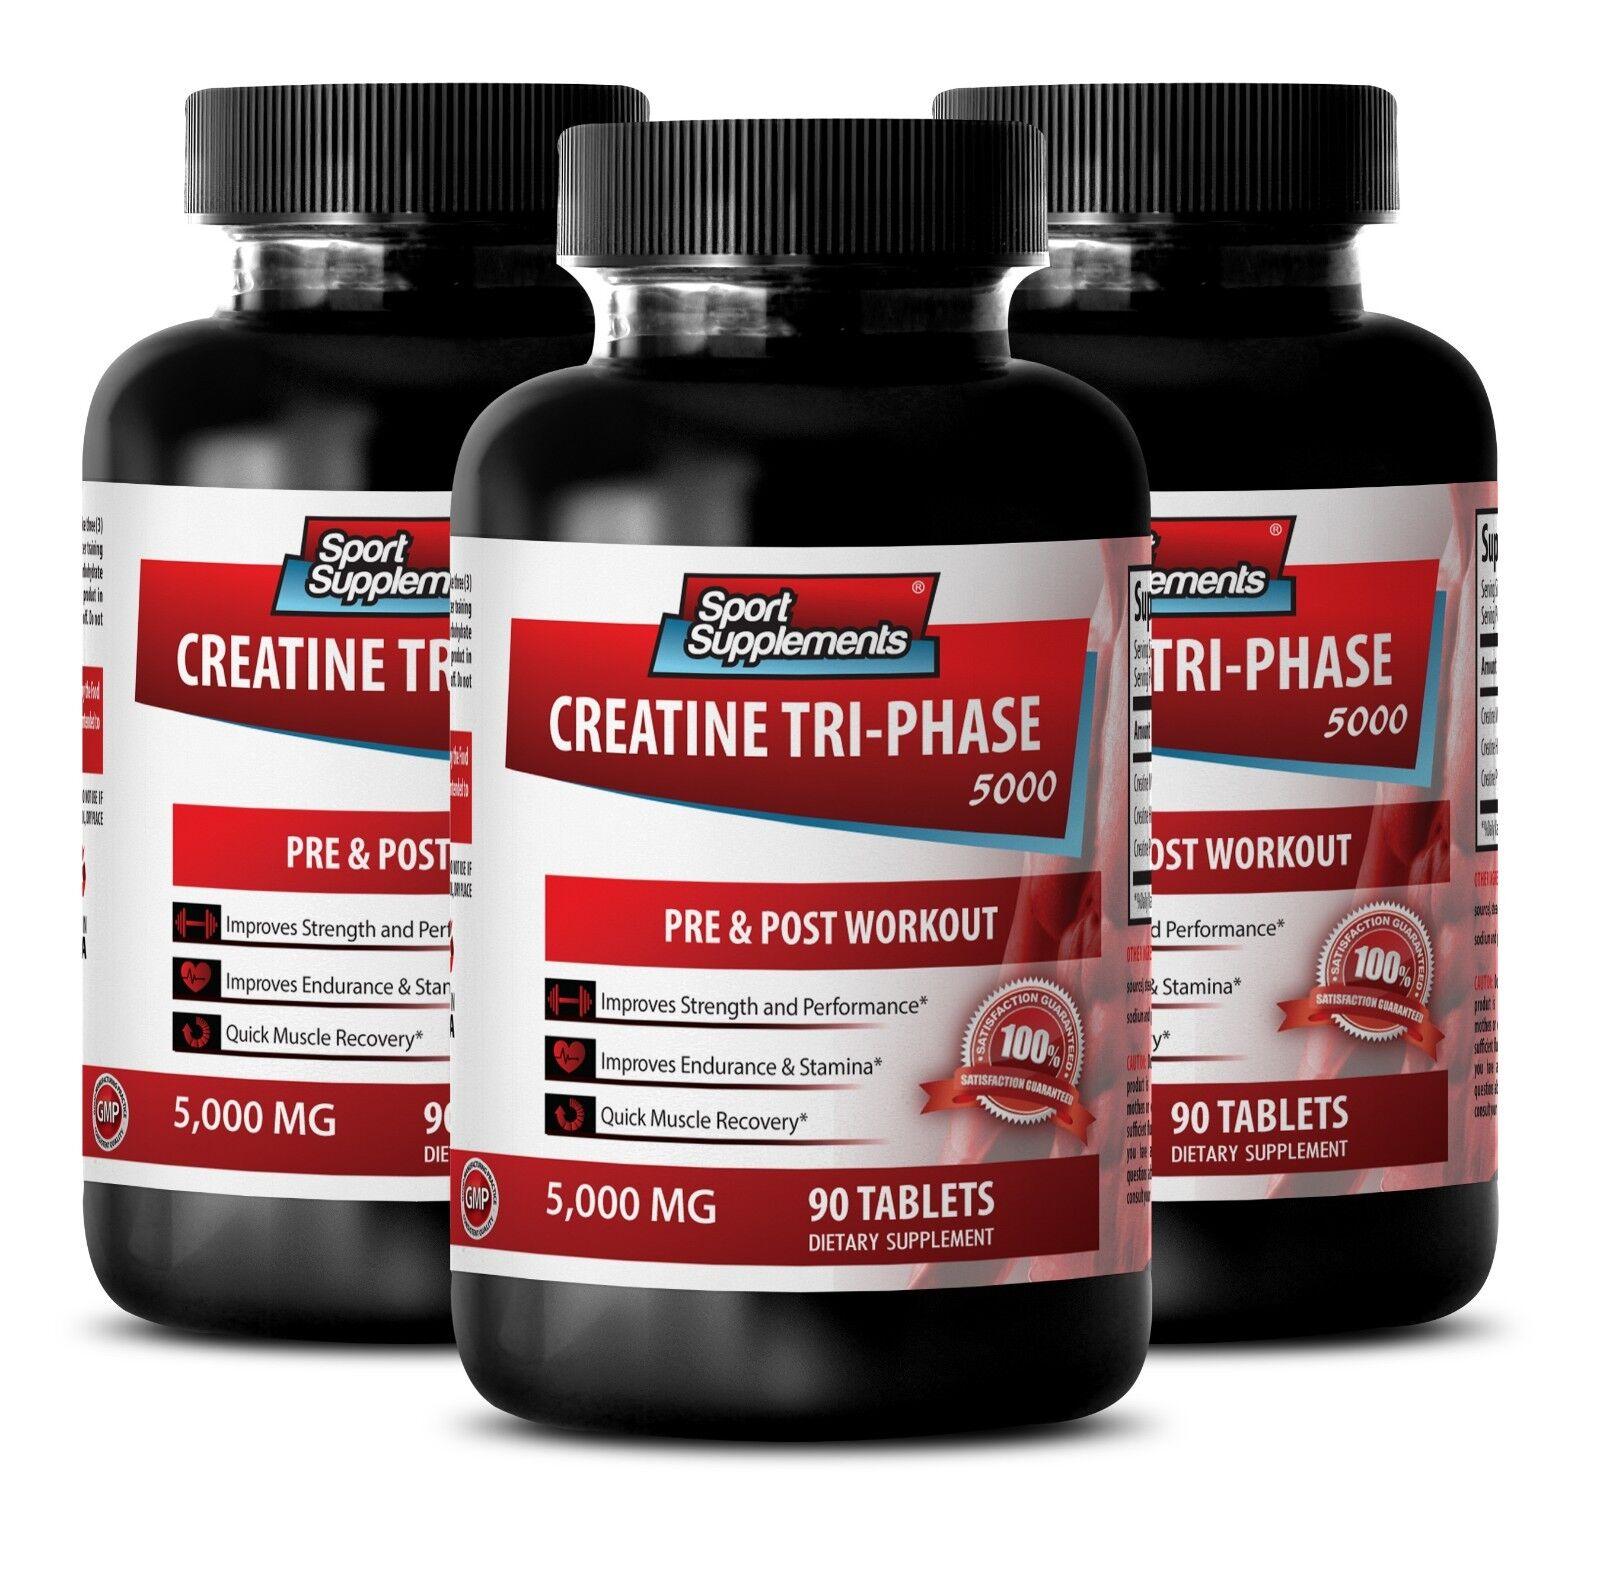 Improves Metabolism Tablets - Creatine 3x 5000mg - Creati...